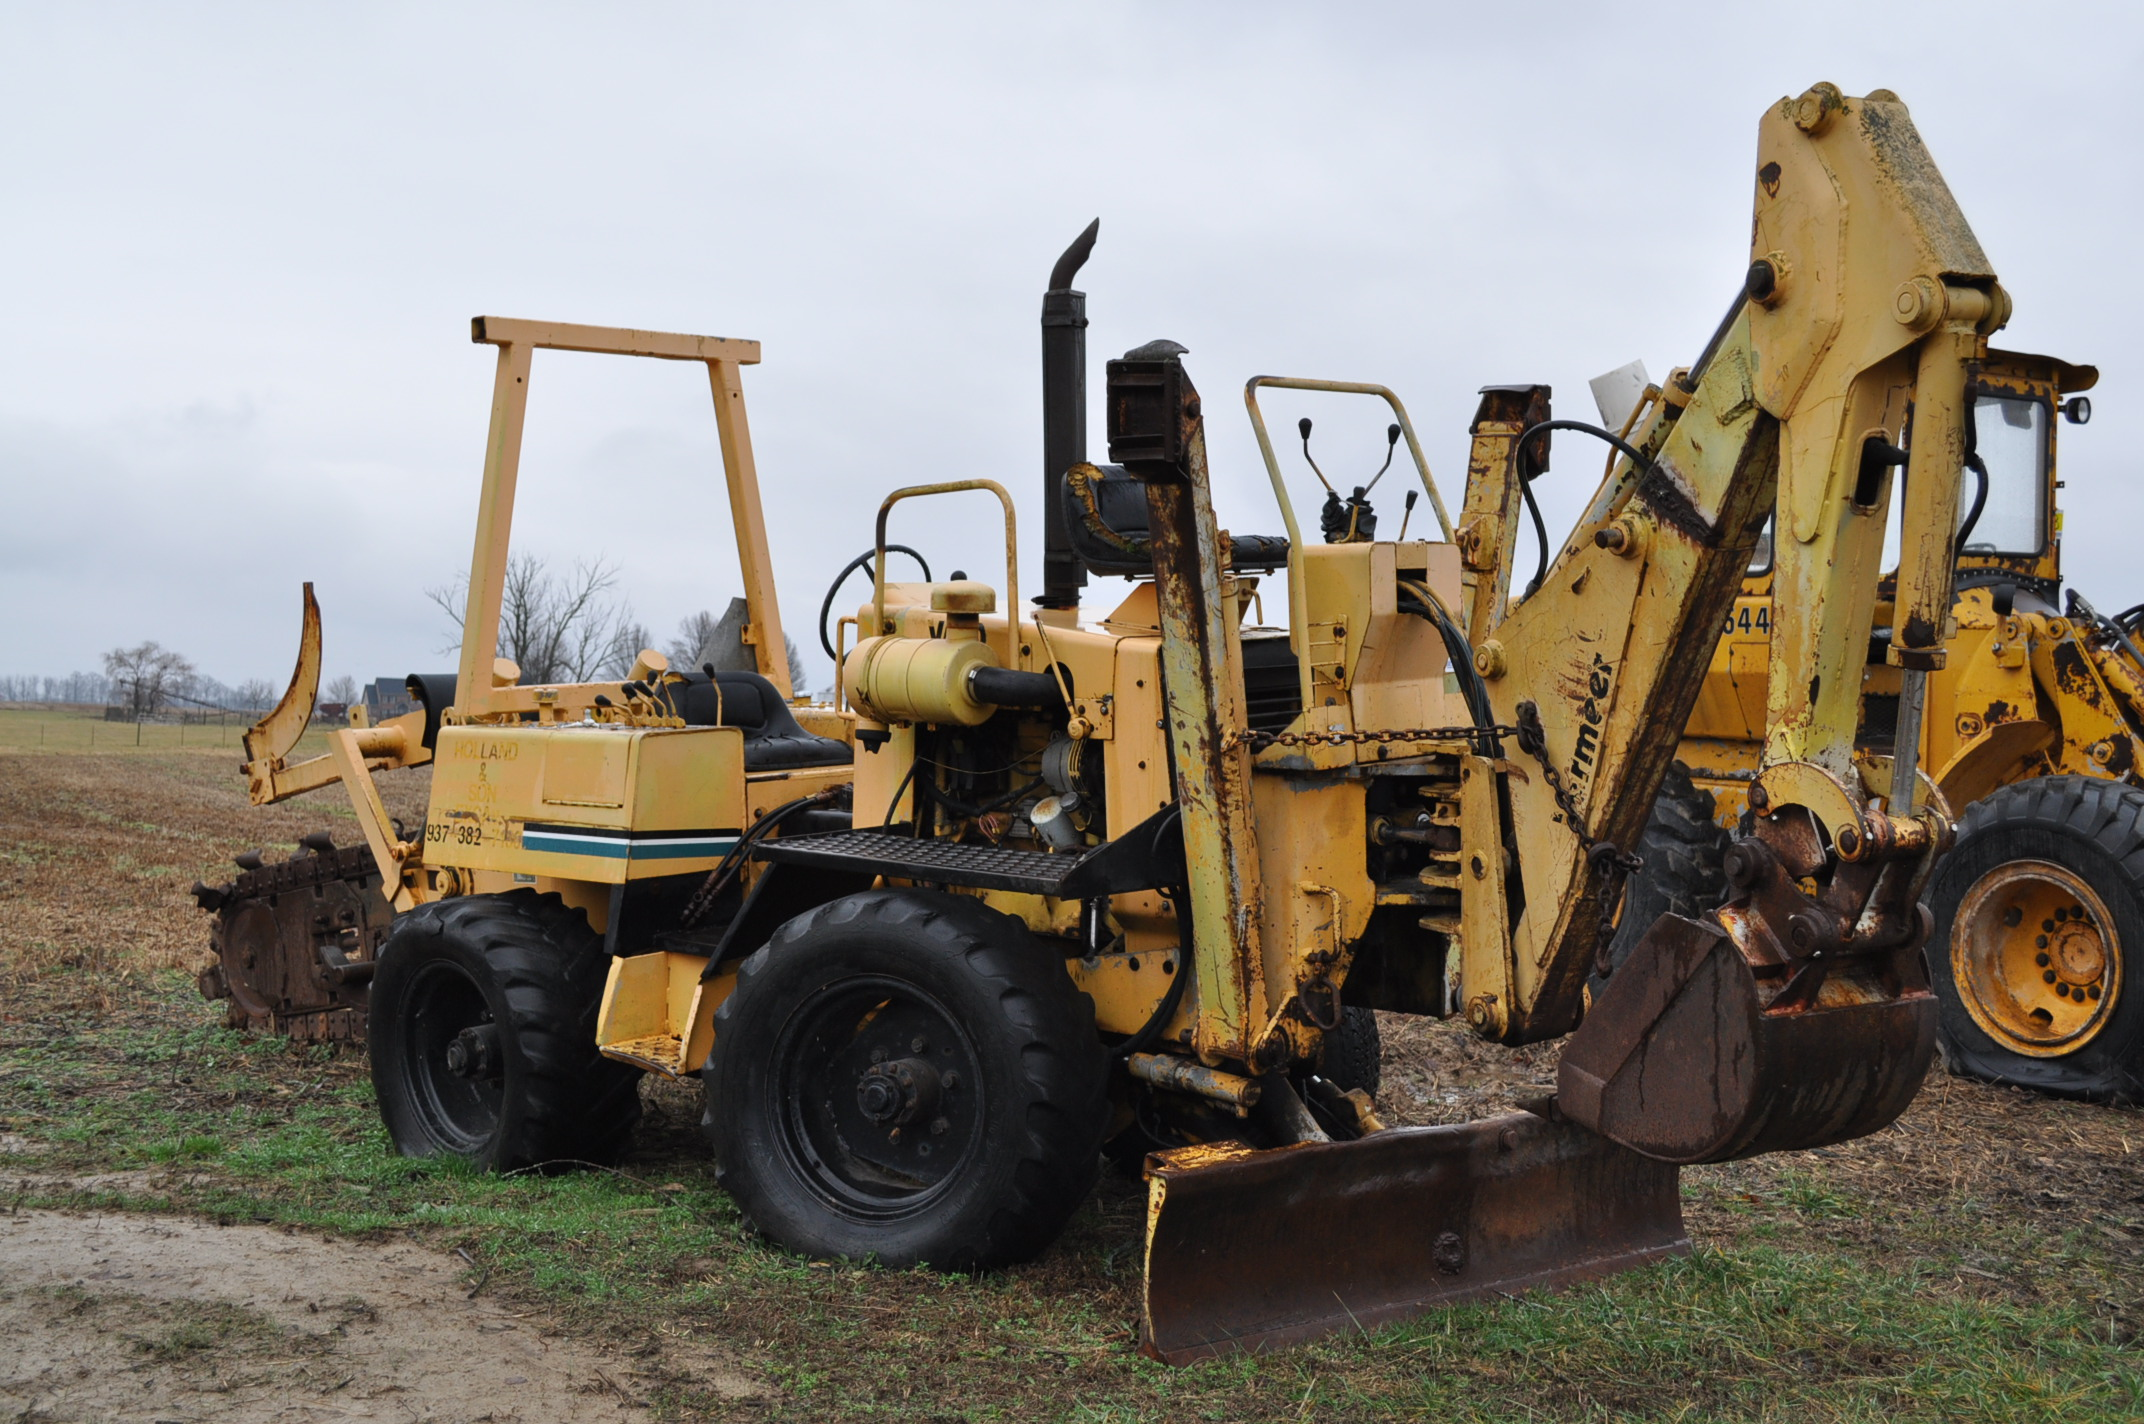 Vermeer V450 Trencher, parts machine, backhoe attachment, JD diesel, SN 1VRF082L2H1000460 - Image 4 of 15